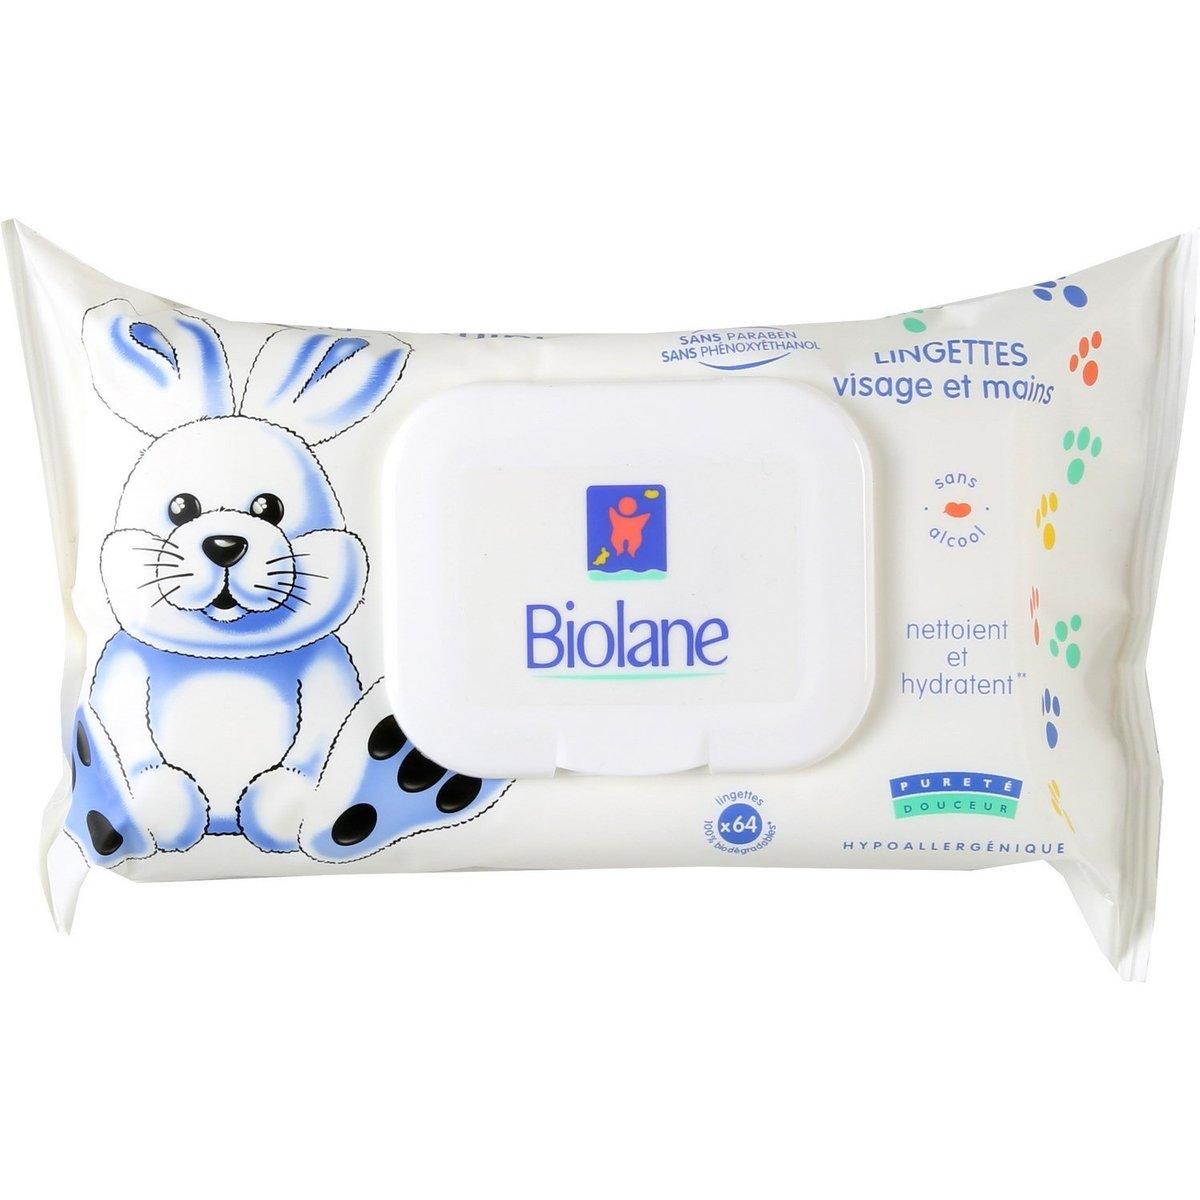 BIOLANE - Face & Hand Wipes - 64 pcs